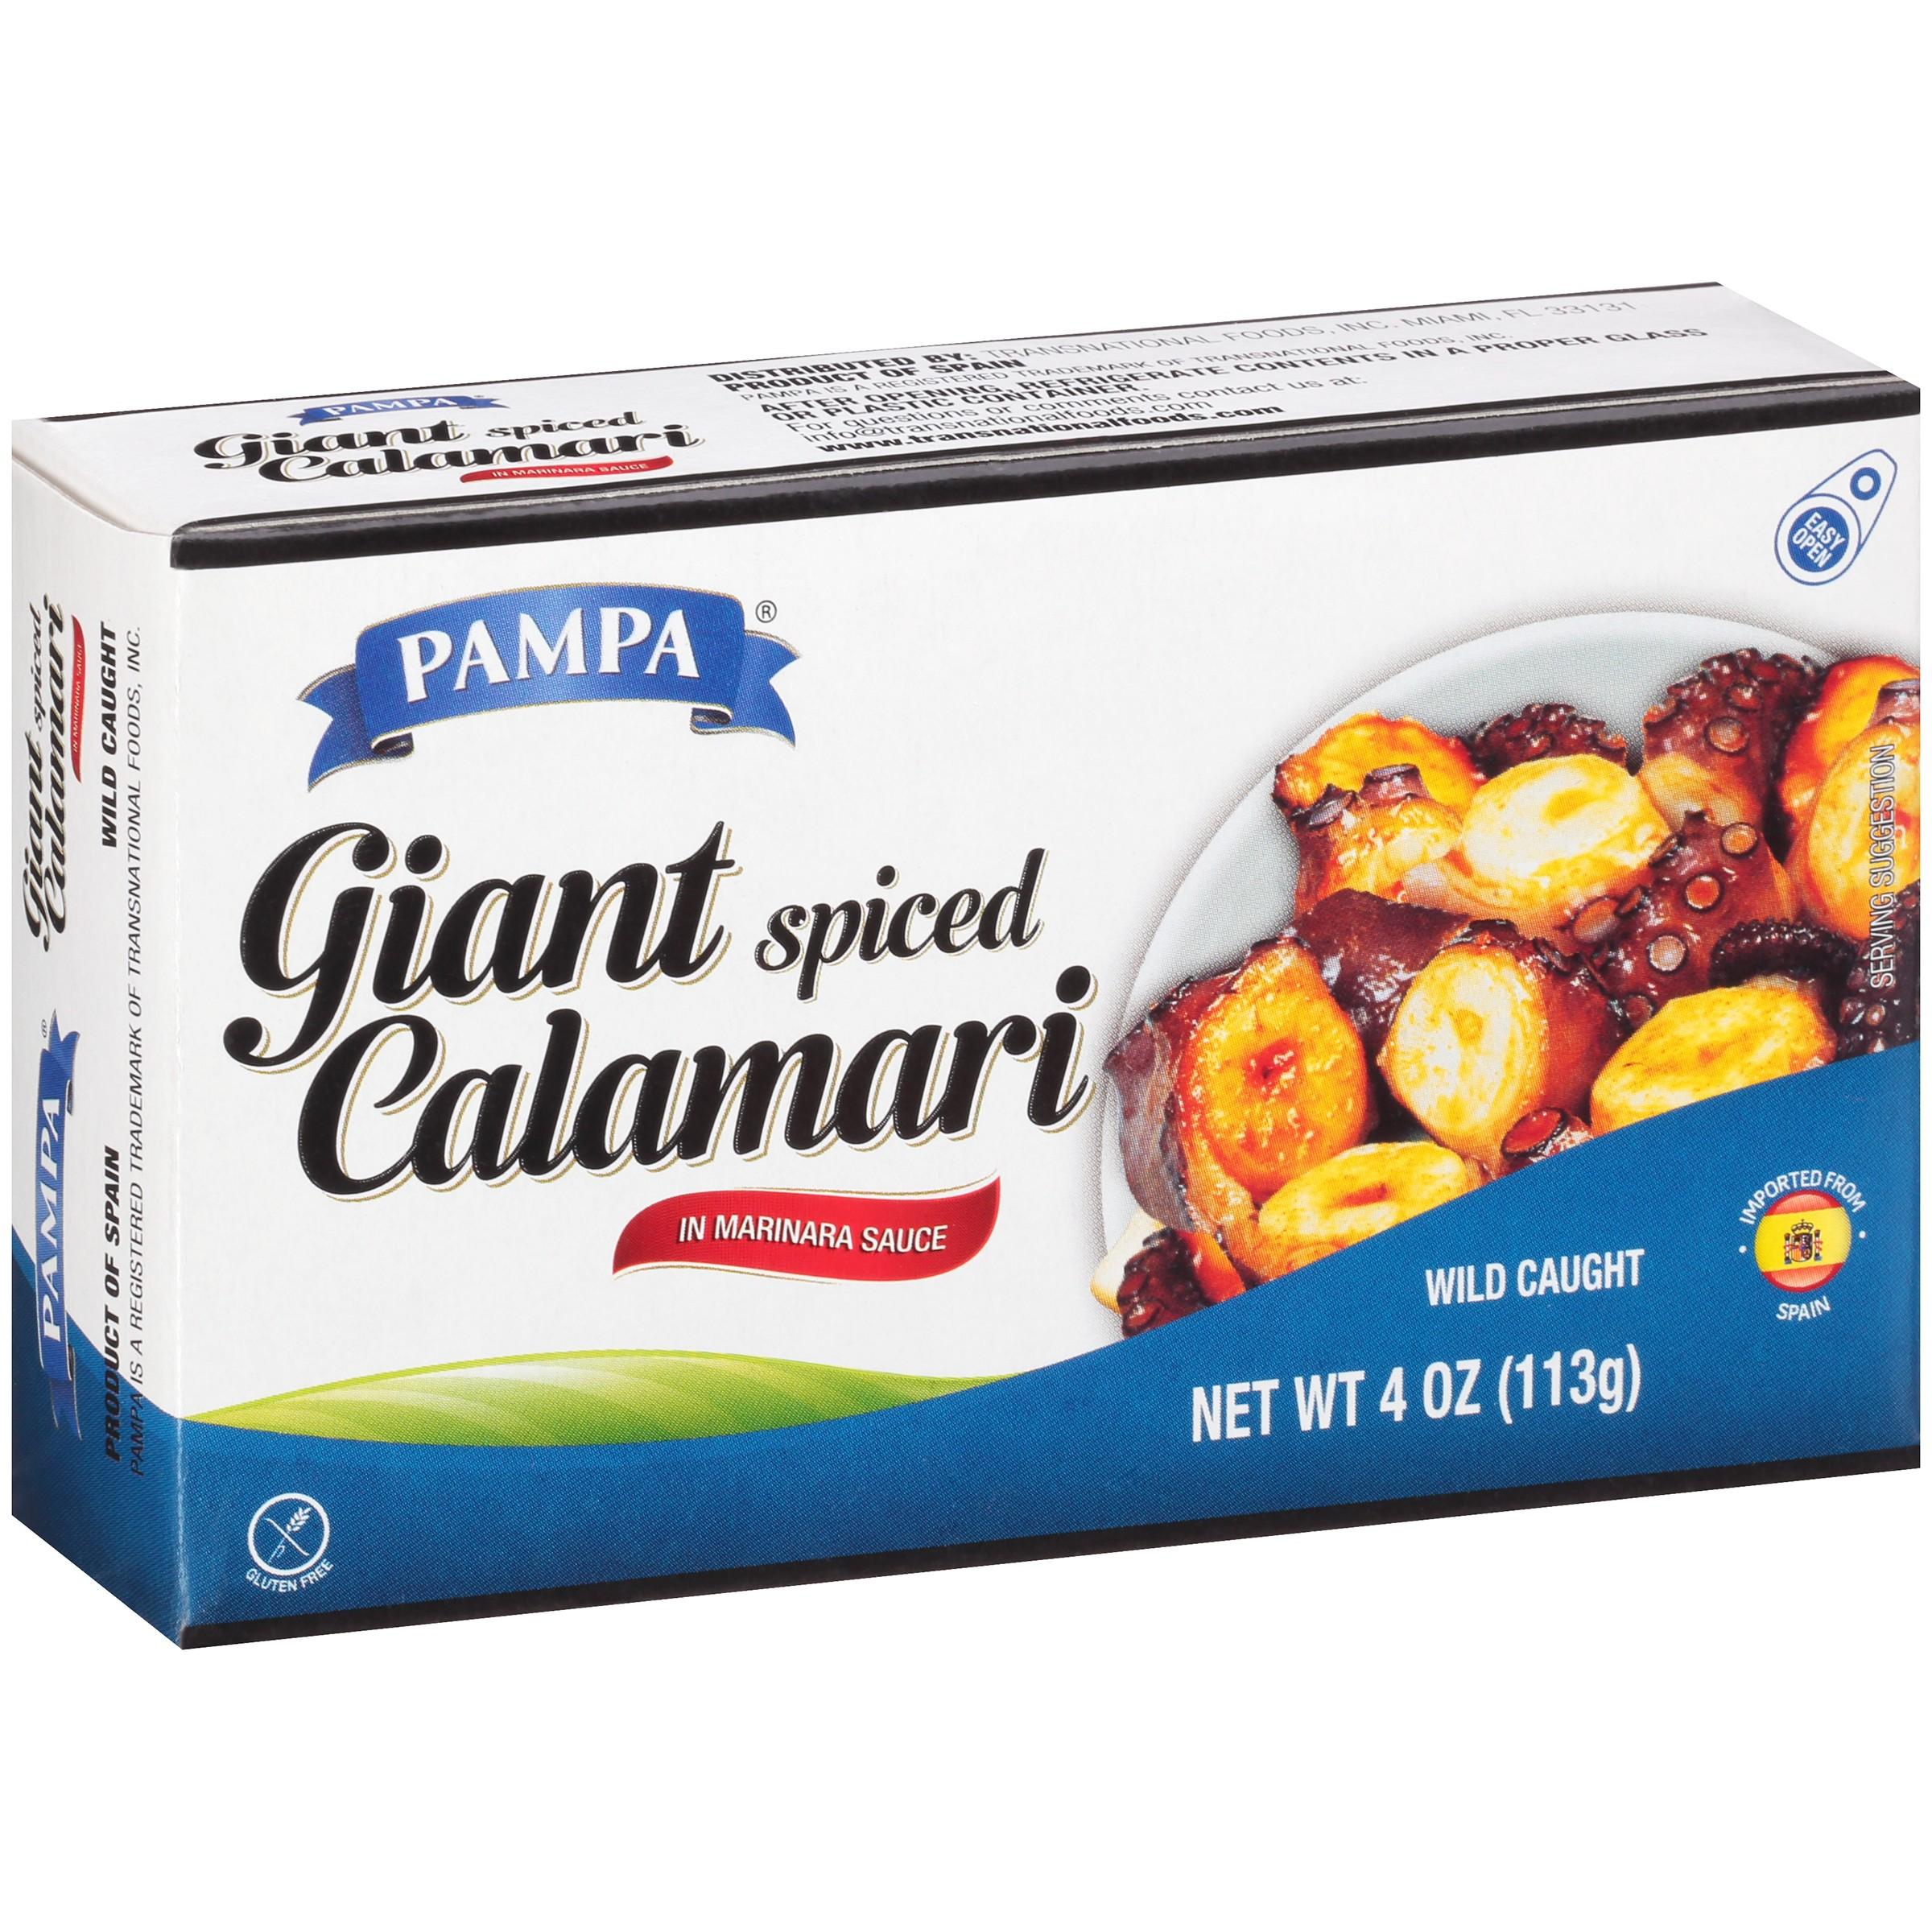 Pampa Giant Spiced Calamari in Marinara, 4 oz Box